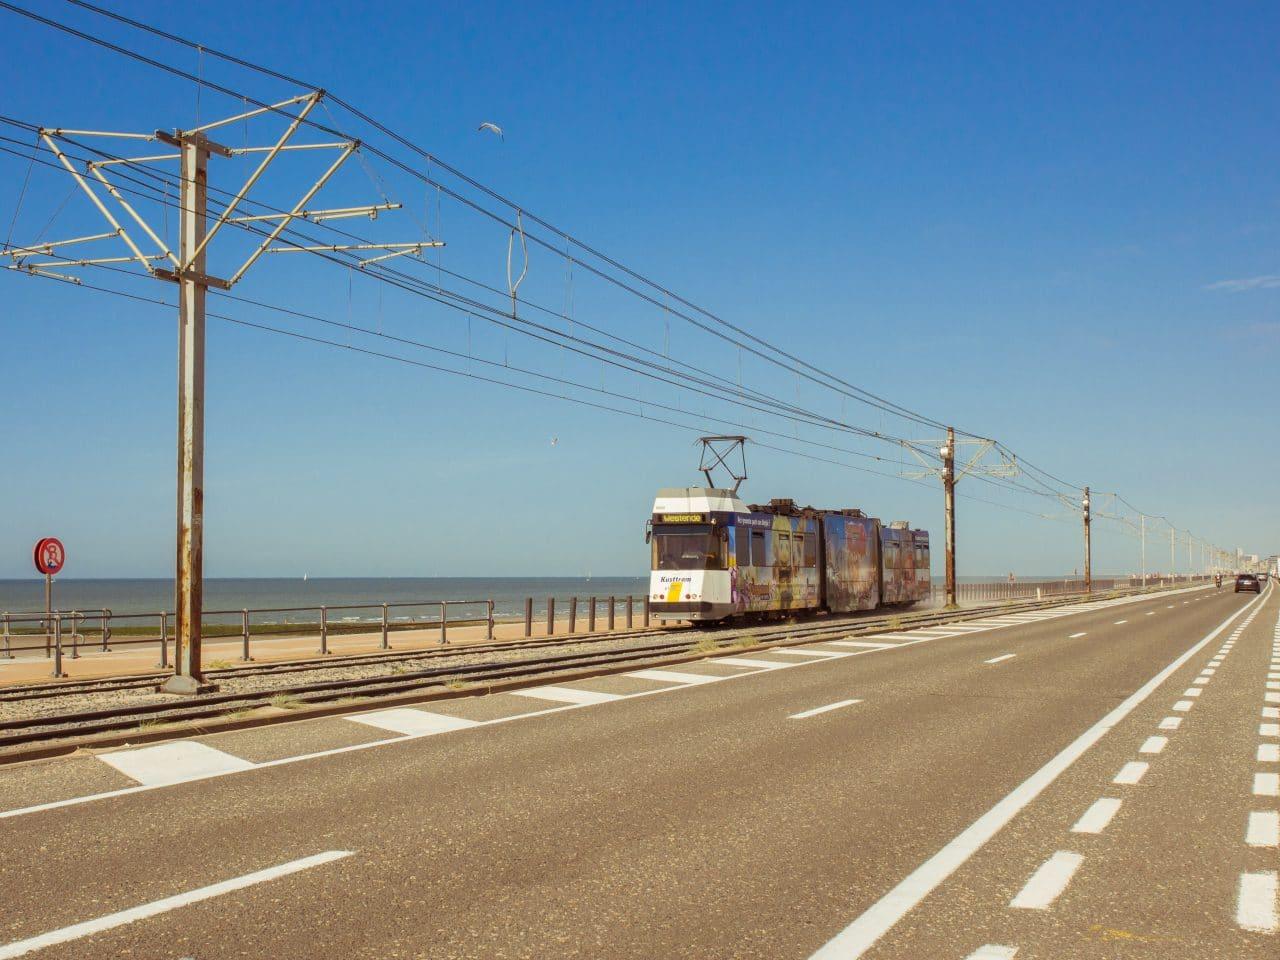 belgique, road trip, tram